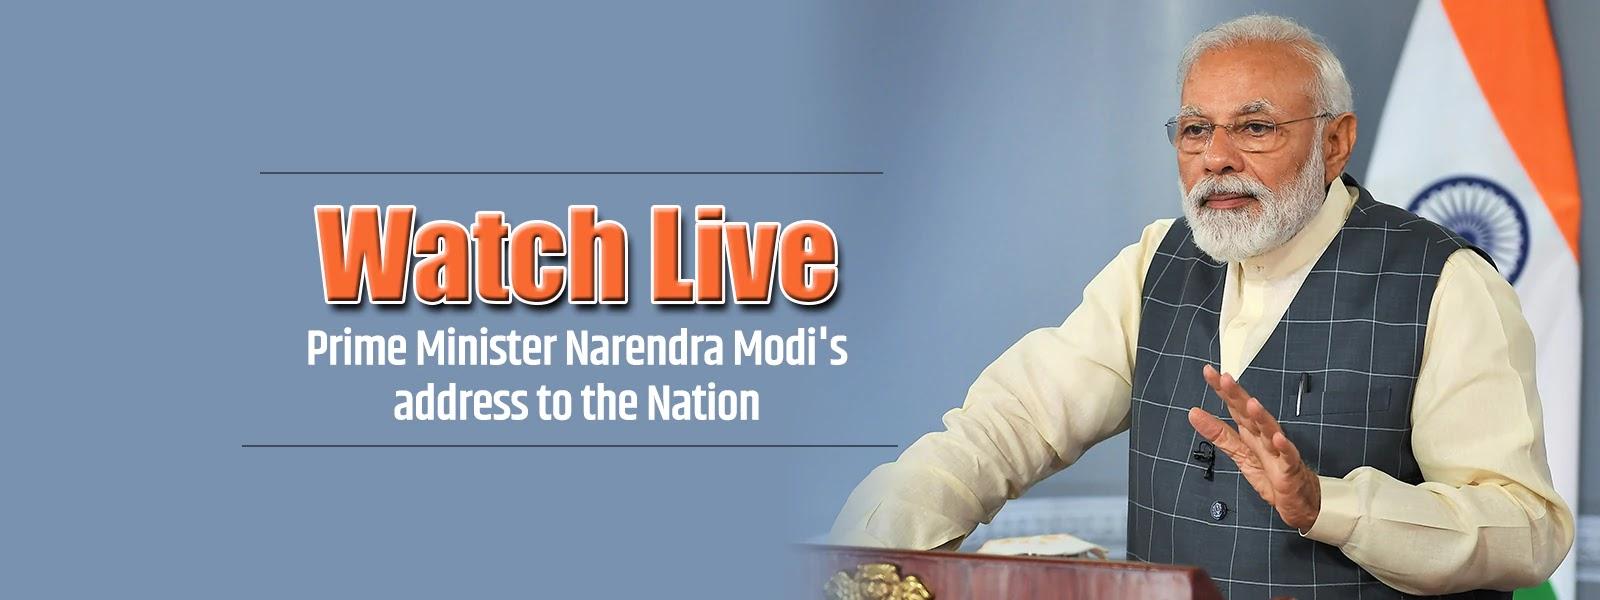 http://www.myojasupdate.com/2019/08/prime-minister-narendra-modi-to-address.html